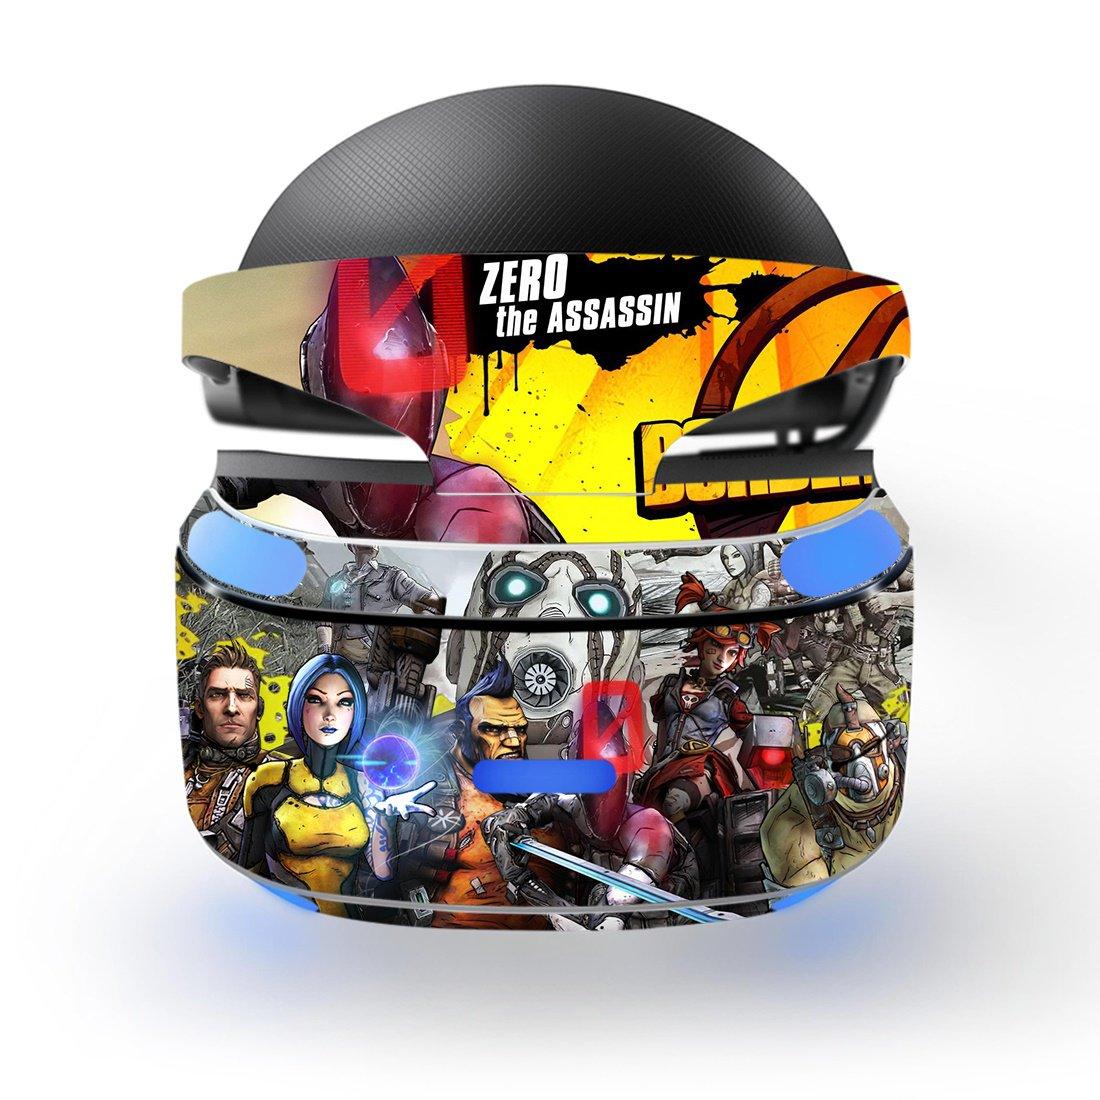 Borderlands 2 Skin Decal for Playstation VR PS4 Headset cover sticker